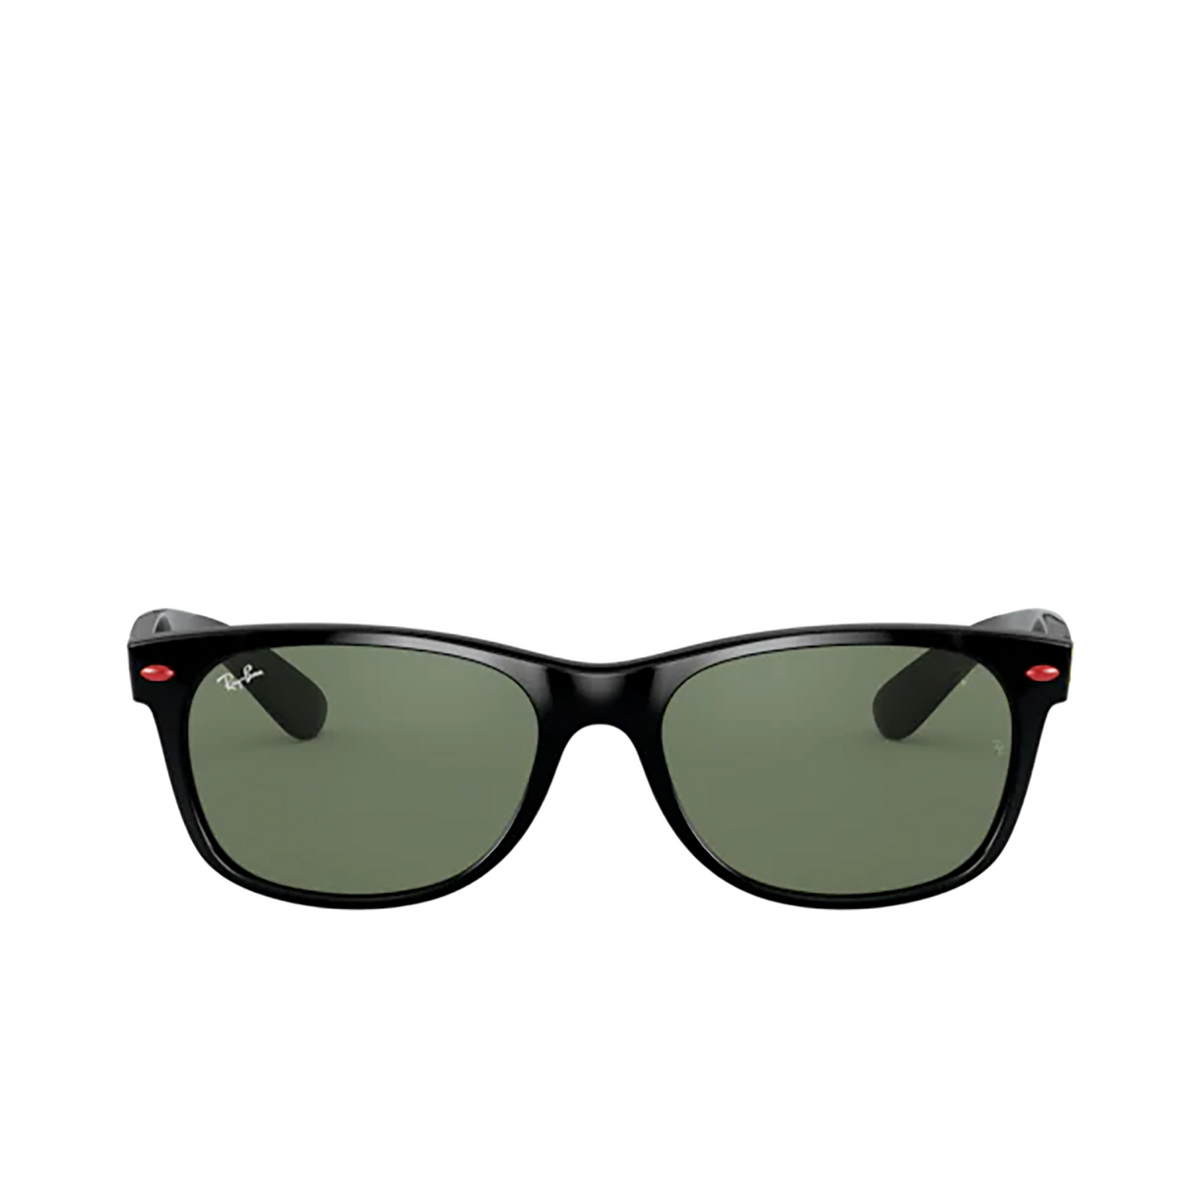 Ray-Ban® Square Sunglasses: New Wayfarer RB2132M color Black F60131 - 1/3.